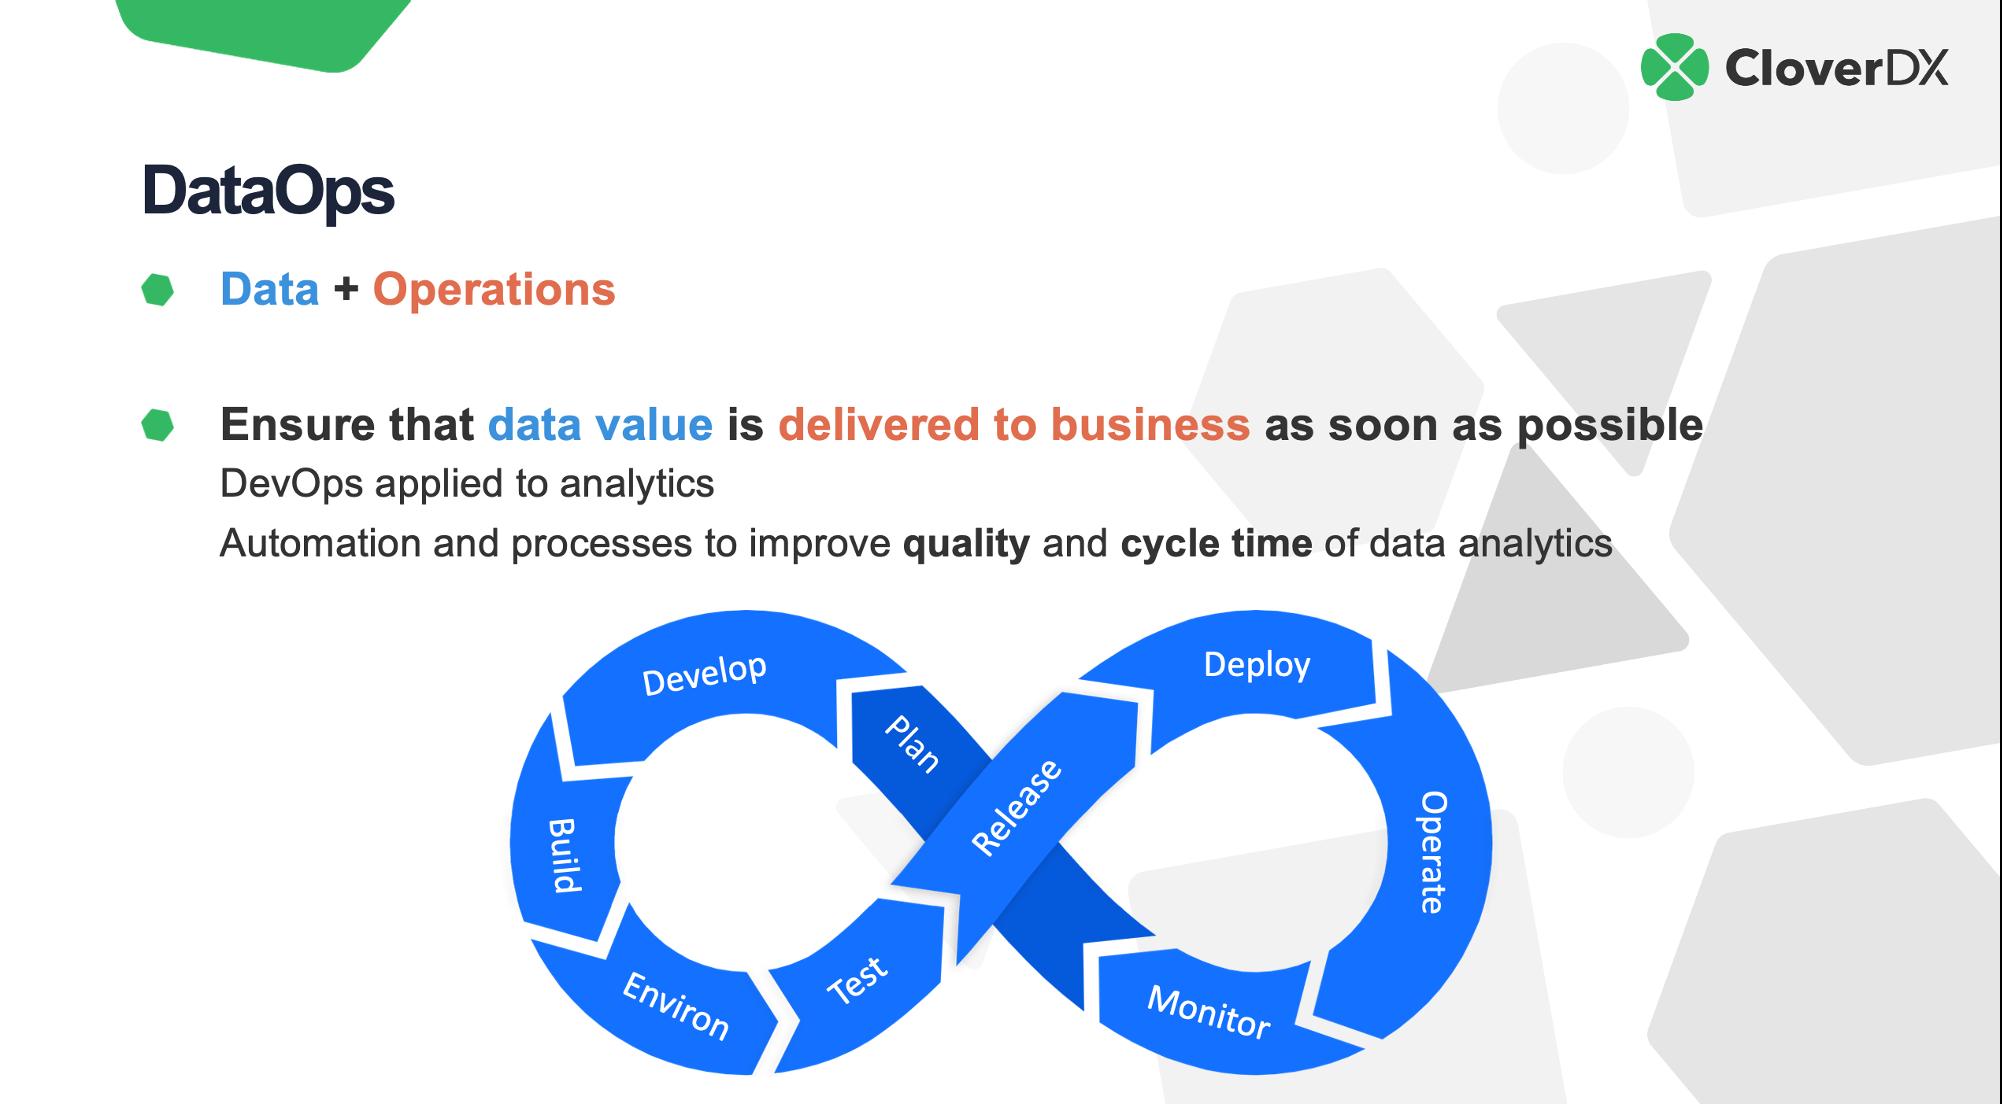 DataOps- data + operations